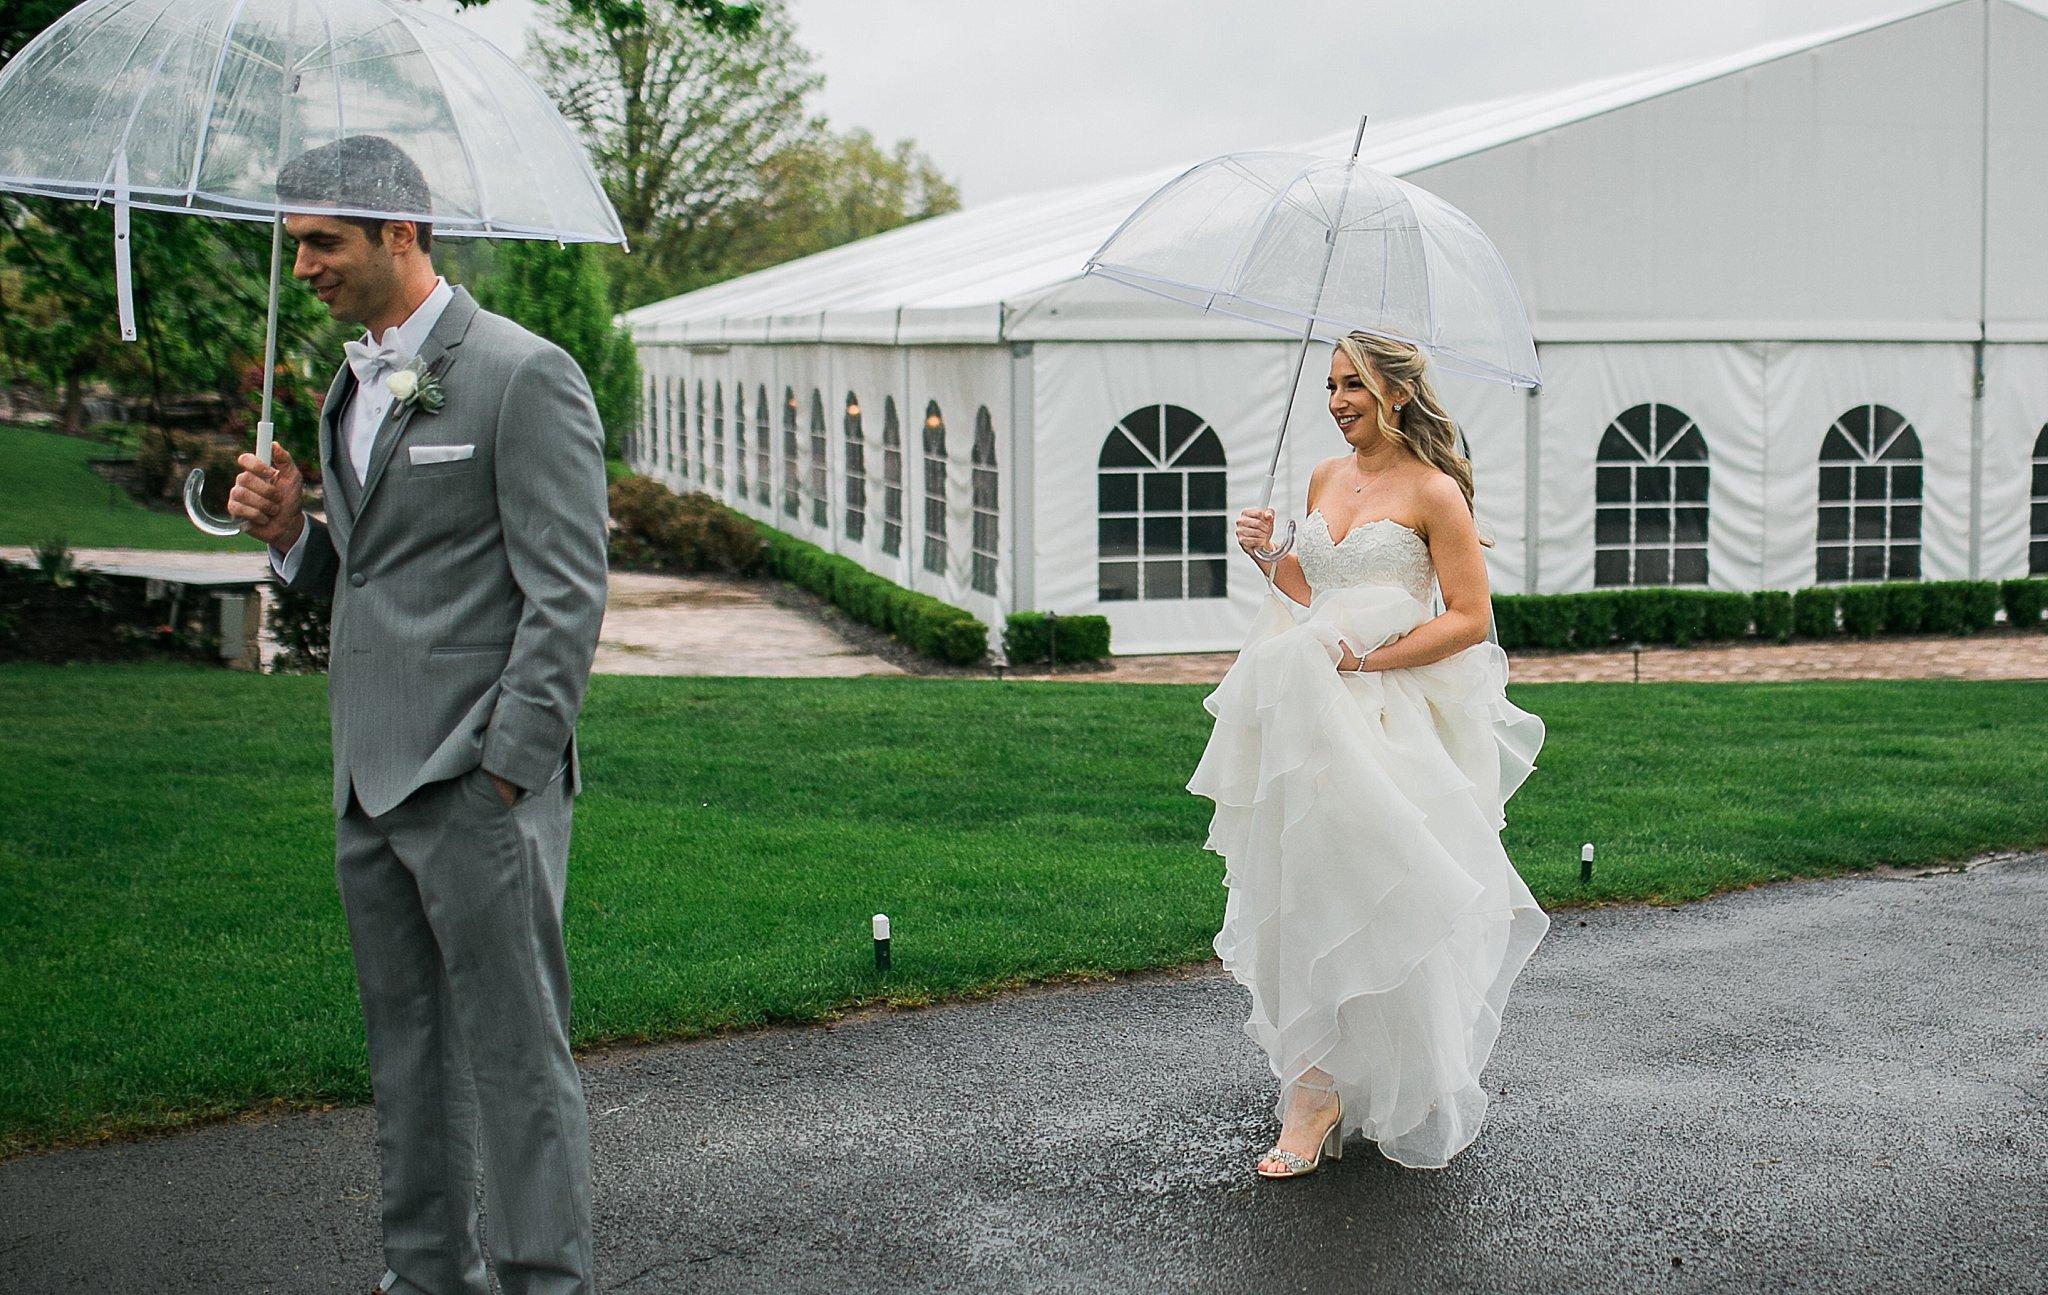 West Hills Country Club Wedding Hudson Valley Wedding Photographer Sweet Alice Photography 24.jpg